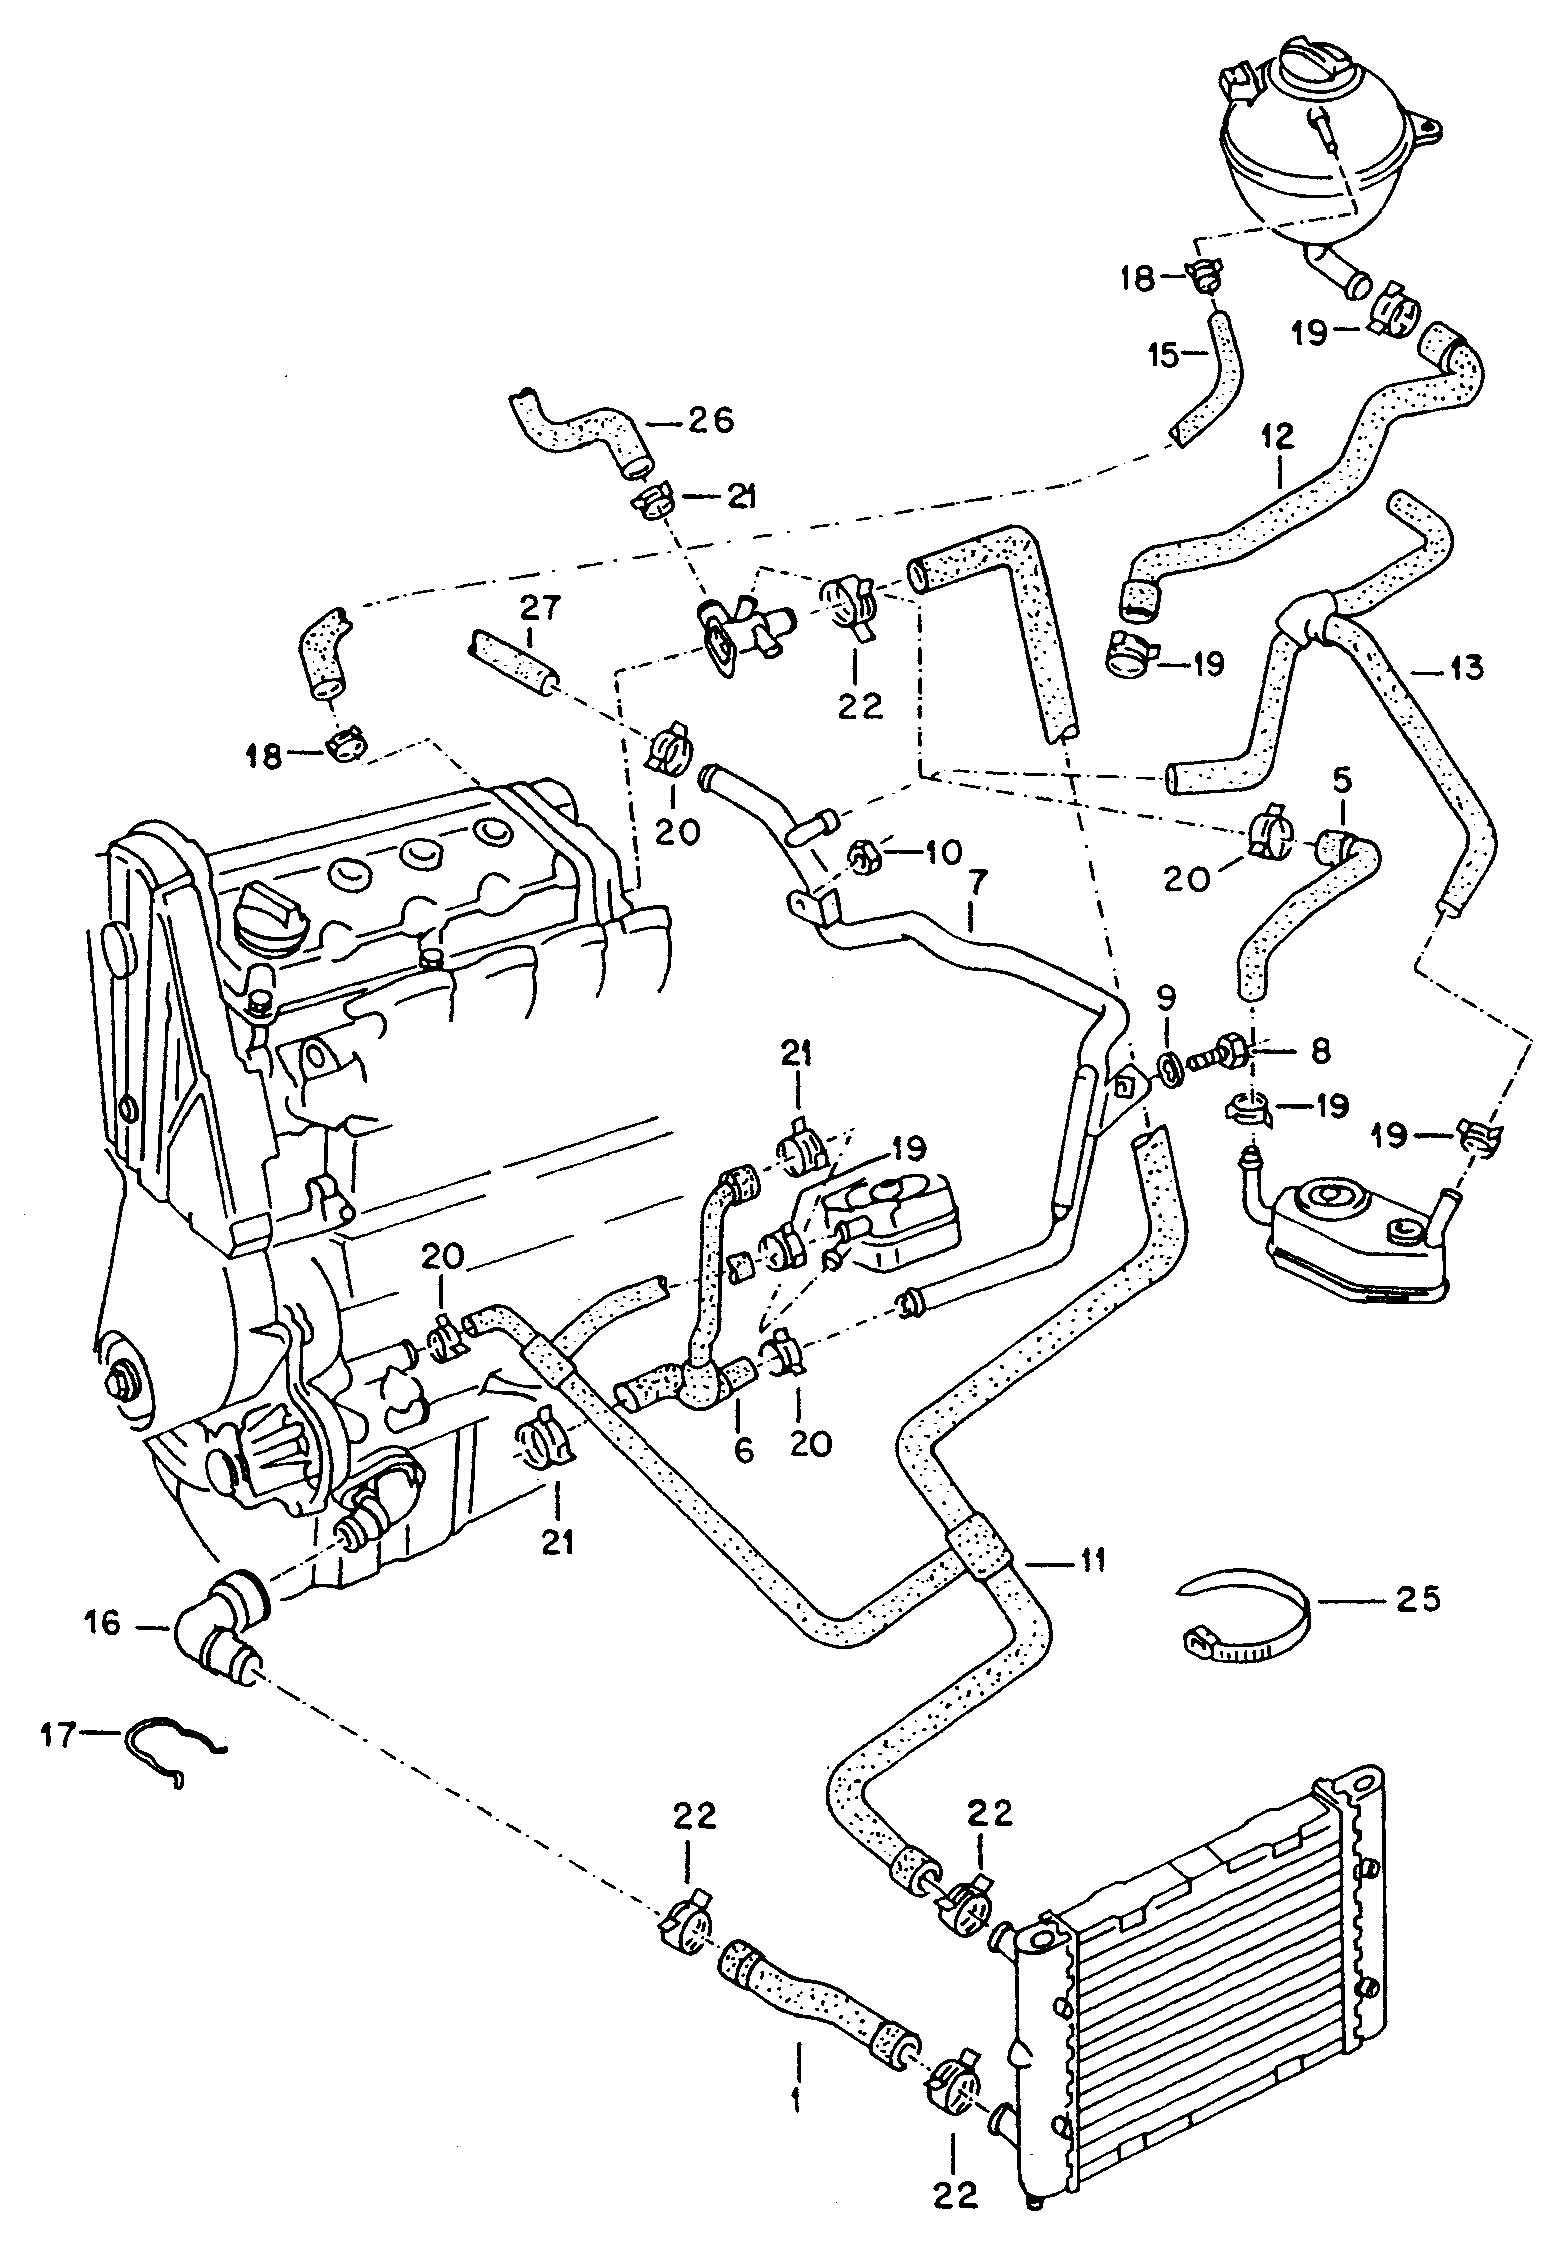 [SCHEMATICS_4PO]  XW_0268] Volkswagen Cooling System Diagram Wiring Diagram   2002 Volkswagen Passat Engine Diagram Water Hoses      Hroni Phae Mohammedshrine Librar Wiring 101